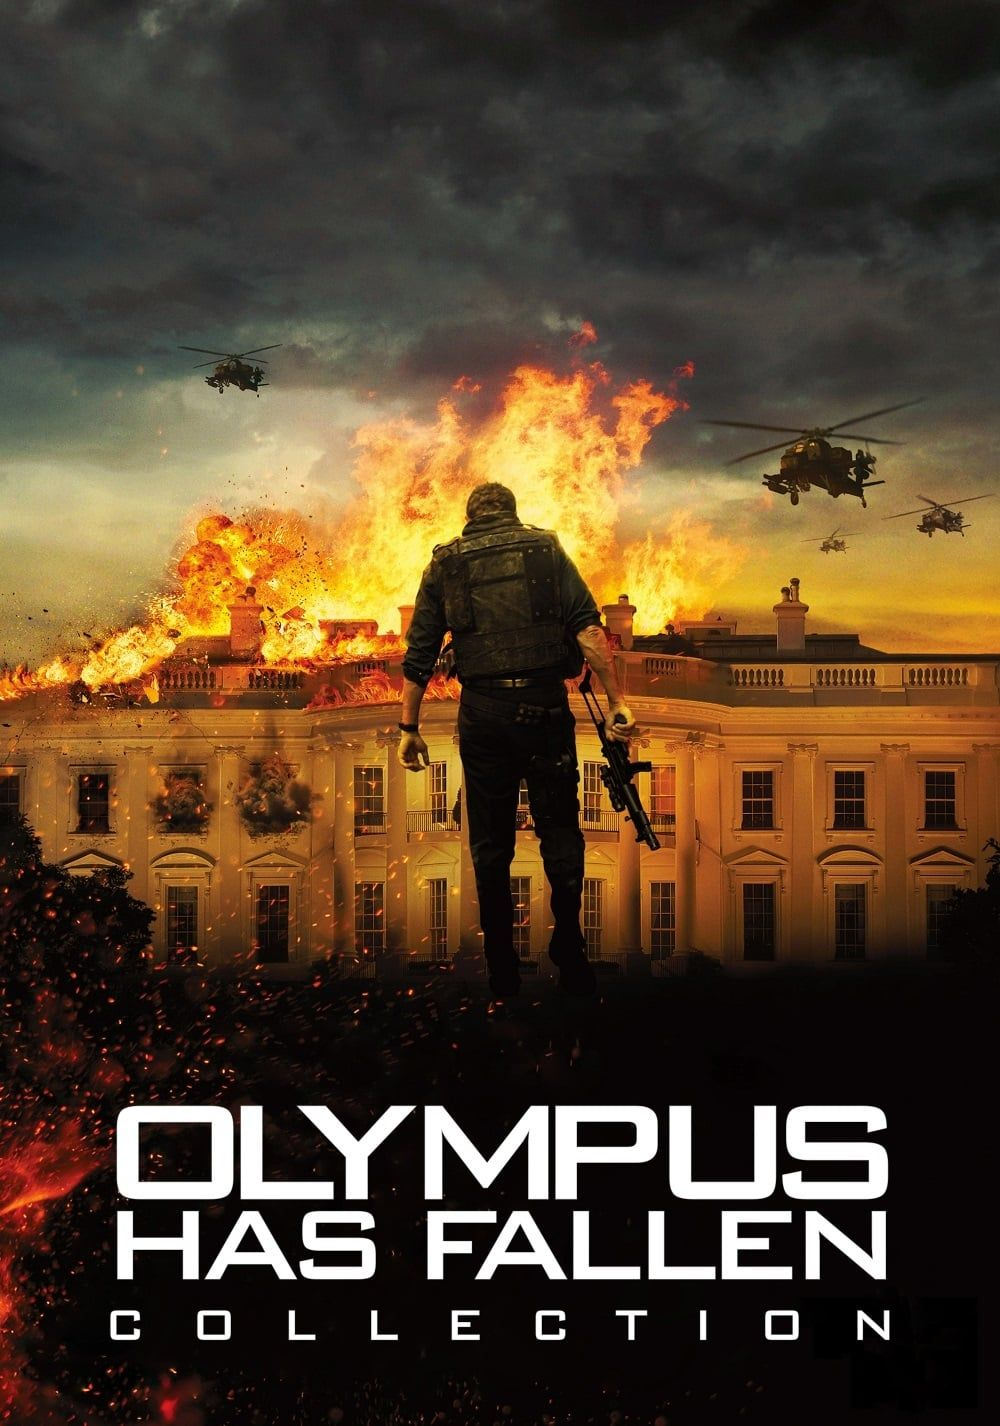 Olympus Has Fallen movie poster poster, bestposter,